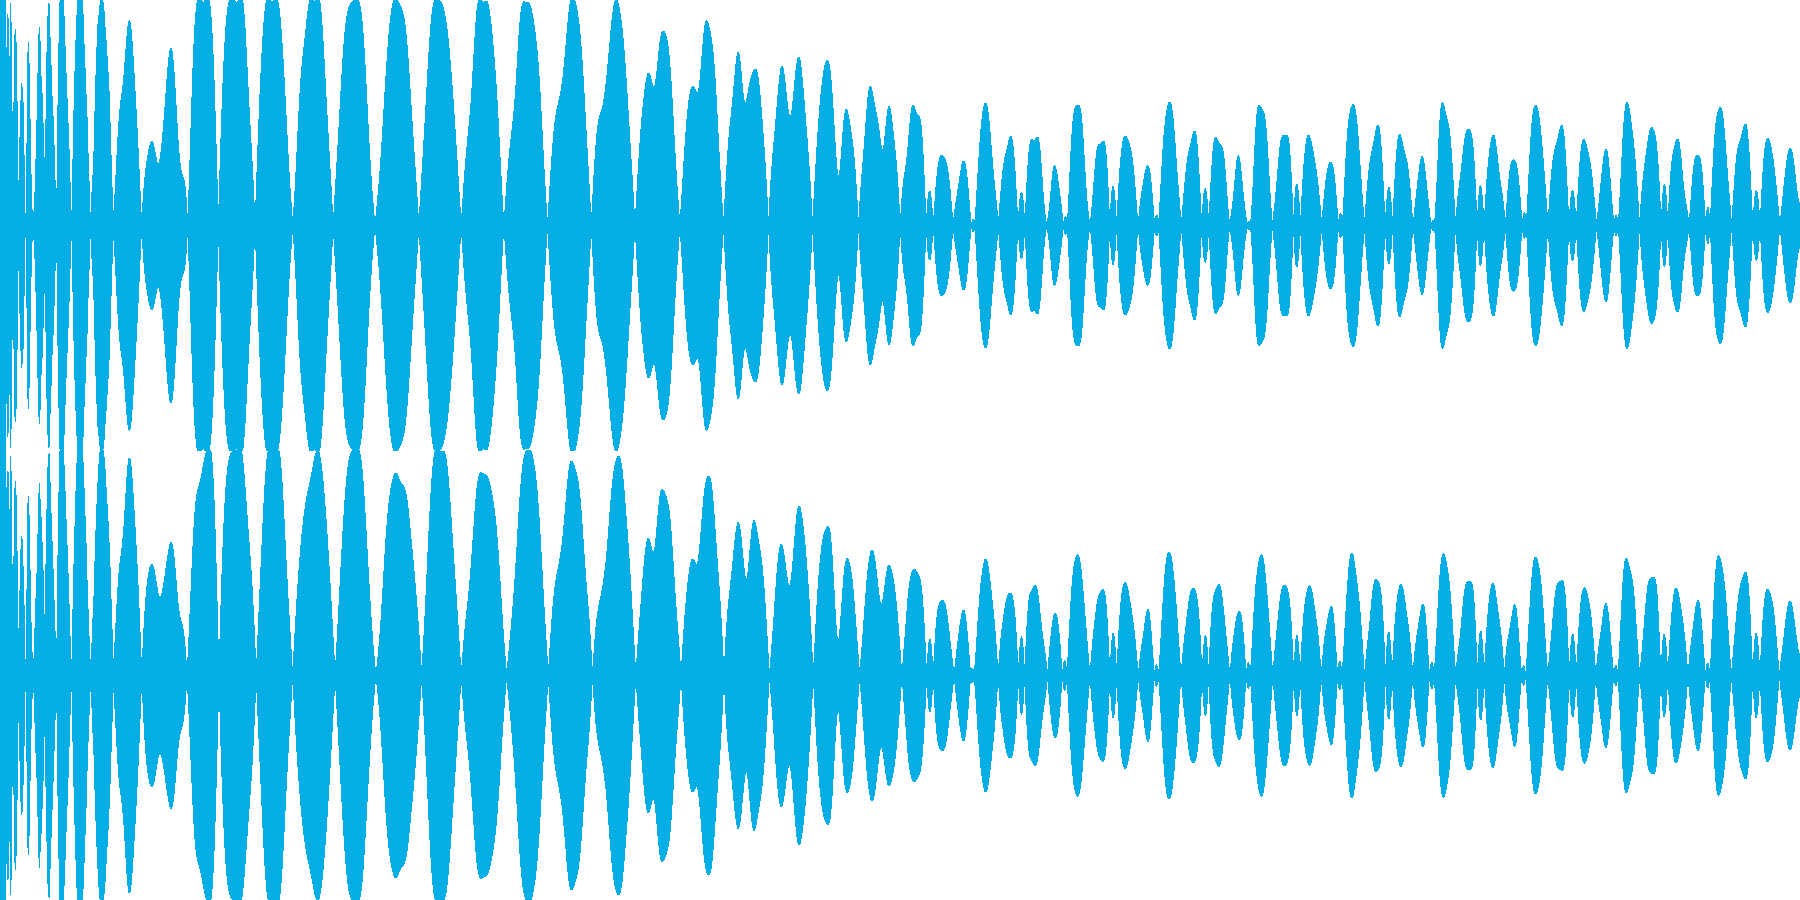 EDMキー(E)入りキック の再生済みの波形